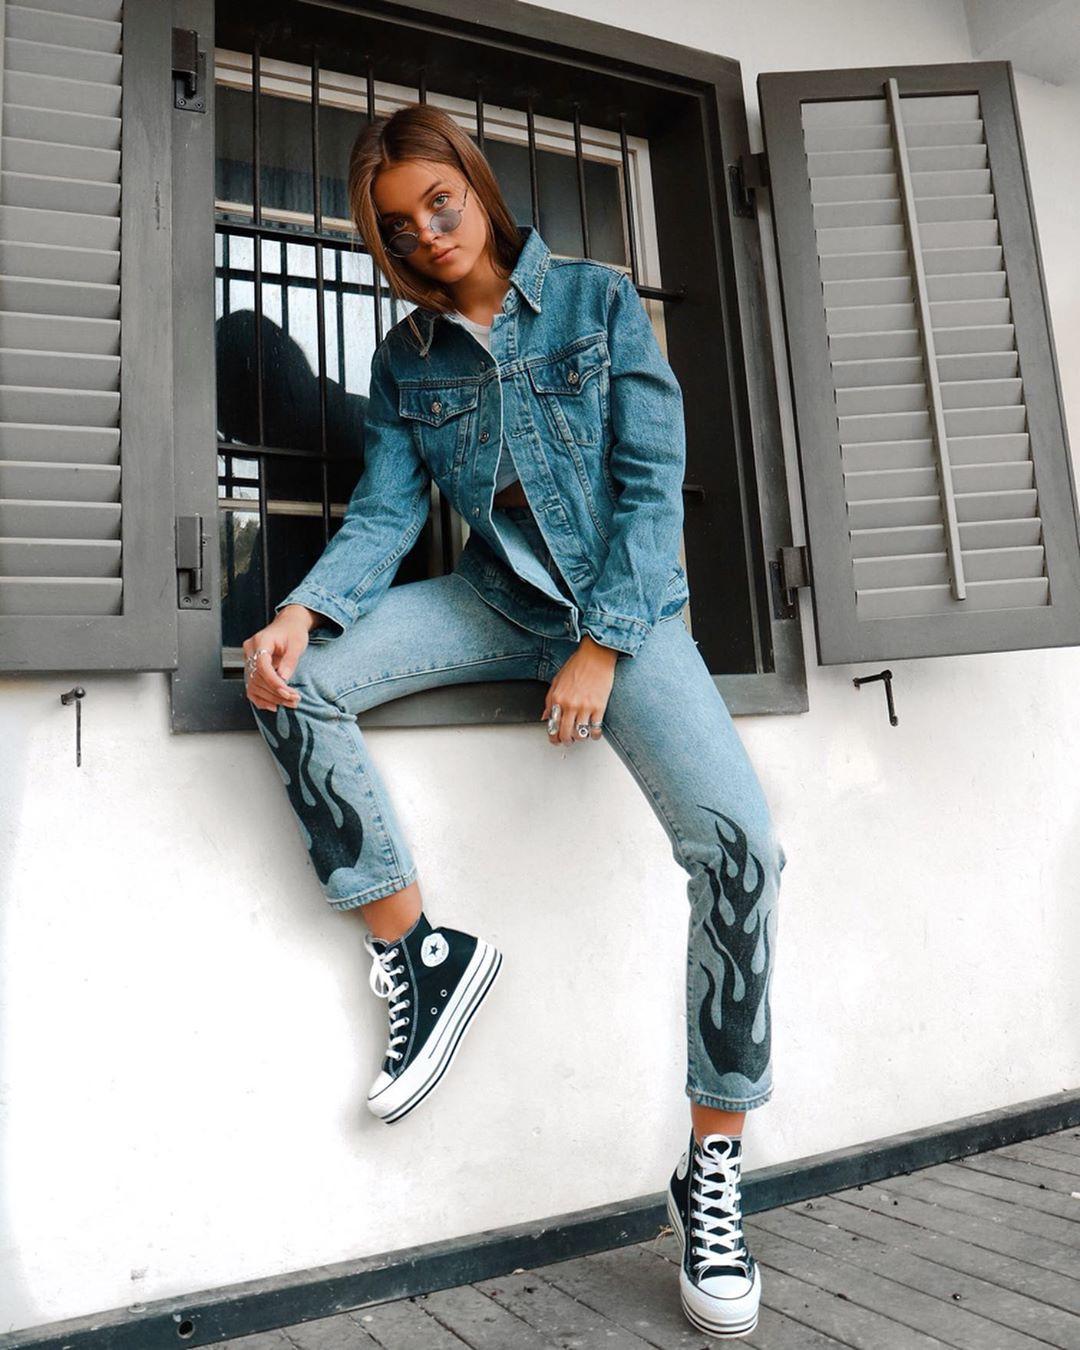 blue colour outfit with jacket, jeans, denim